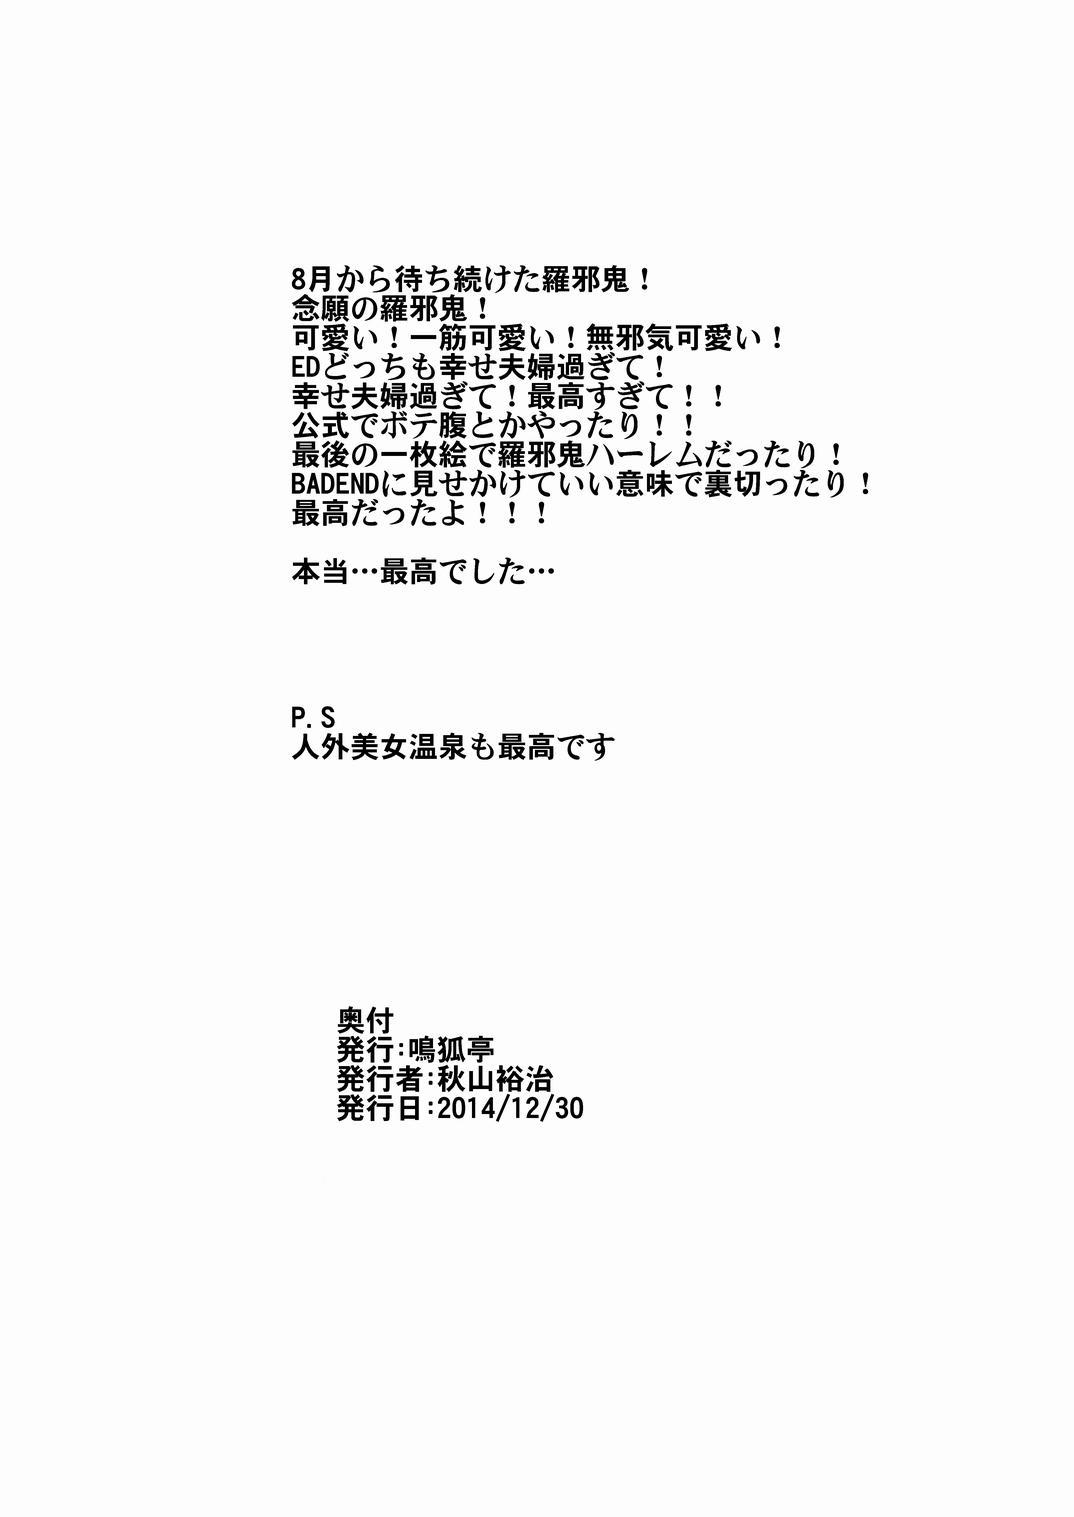 Jorōgumo no oni kan no wazawai 16